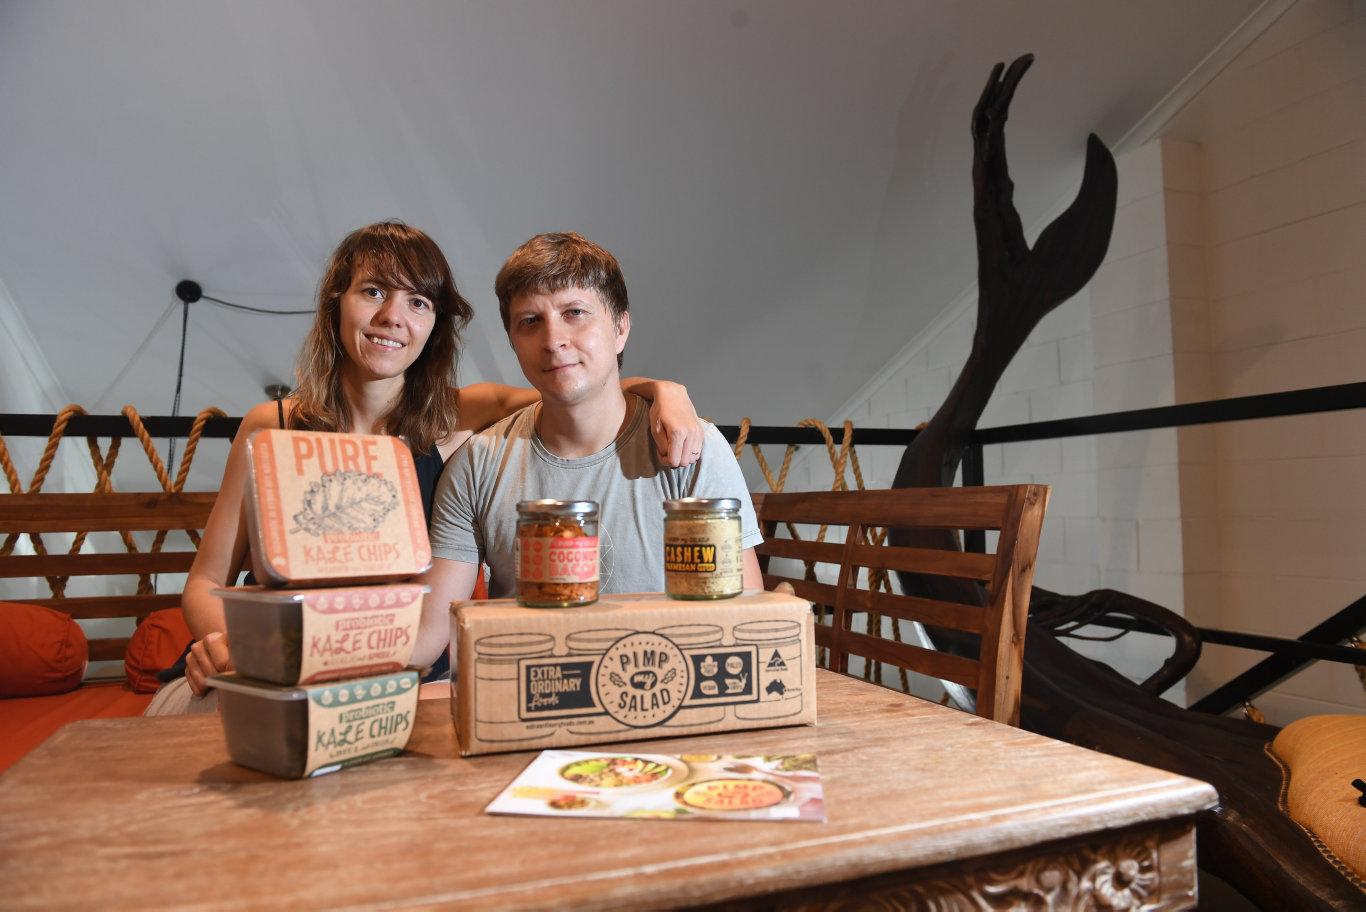 EXTRAORDINARY BUSINESS: Extraordinary Foods founders Alex Komarov and Olga Plotnikova at their Northern Rivers production facility.